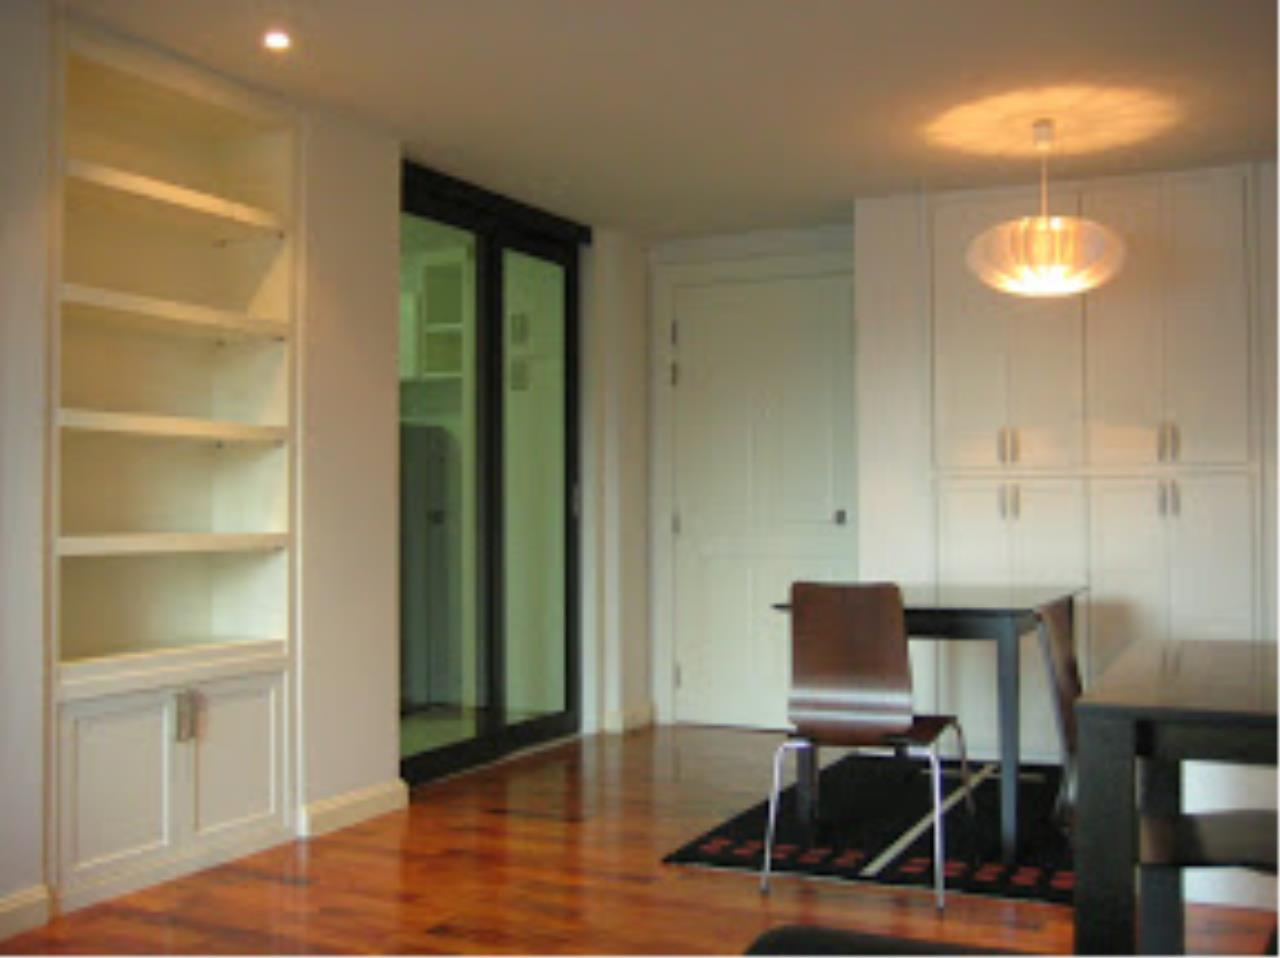 BKK Condos Agency's 1 bedroom condo for rent in Thong Lo at 49 Plus  19